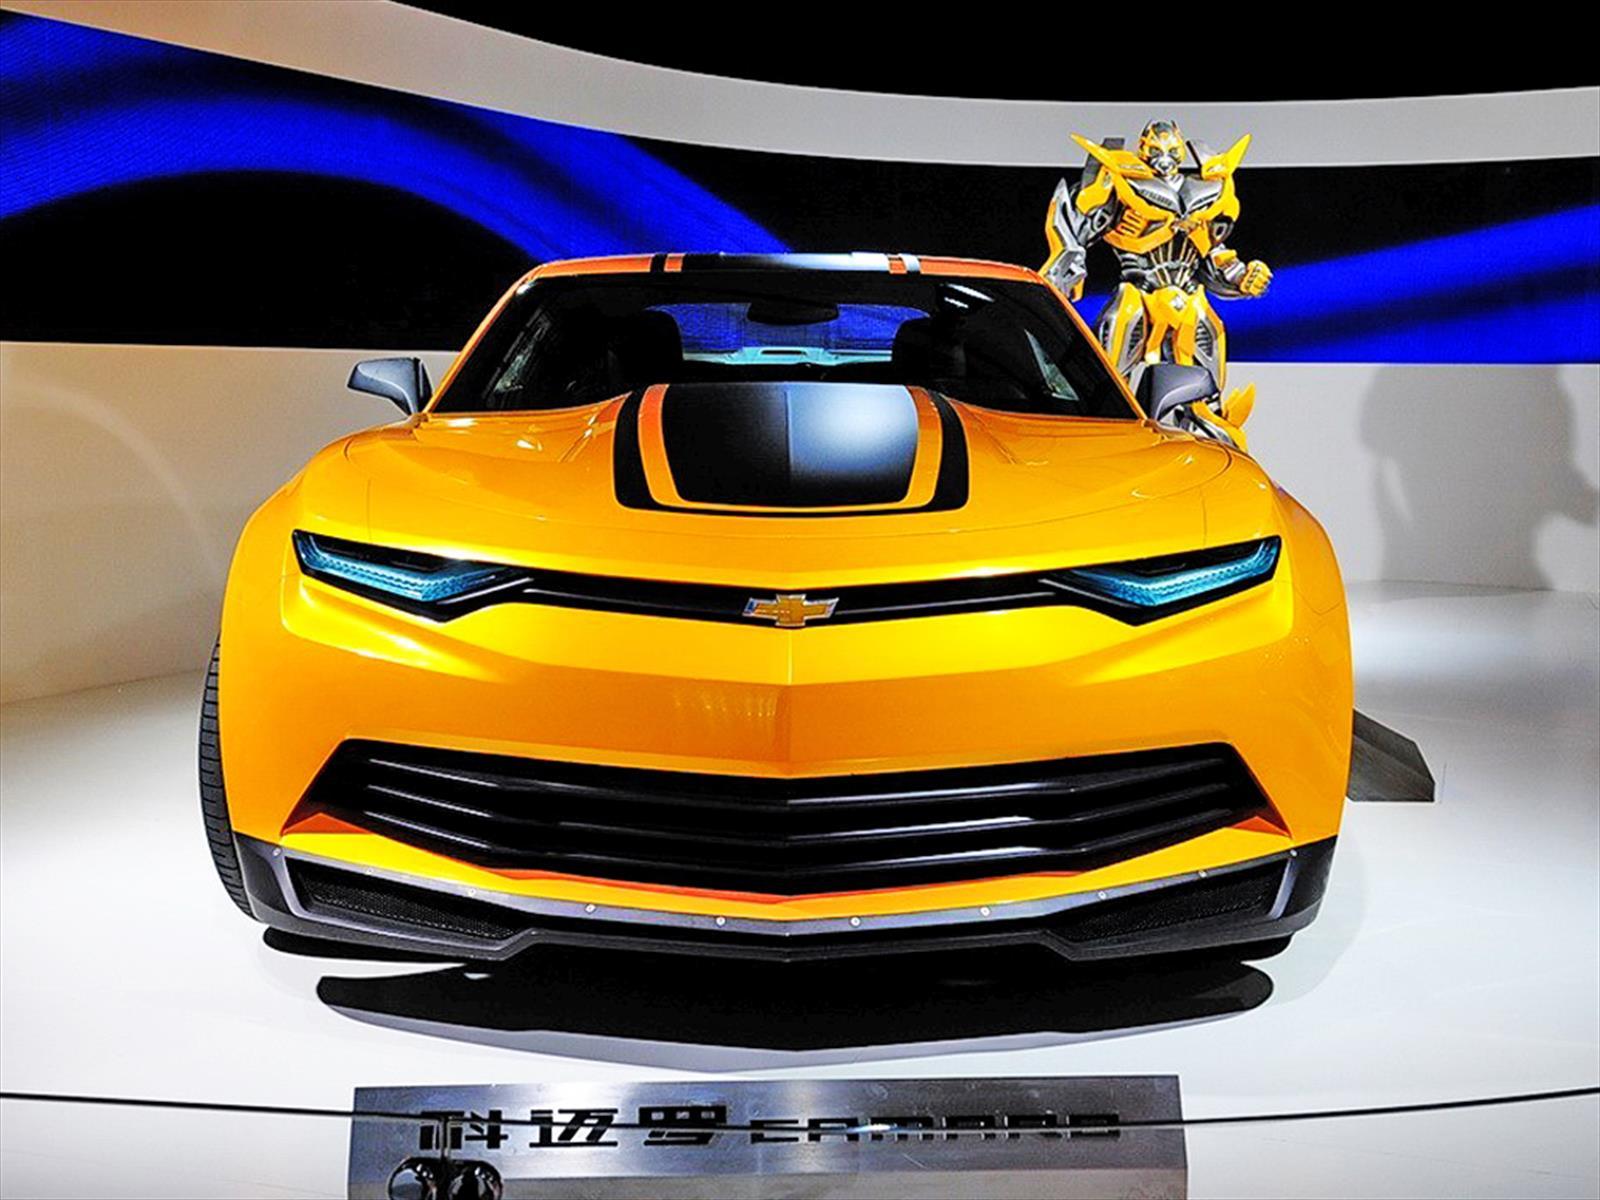 Transformers La Pelcula Que Hizo Del Camaro Una Estrella